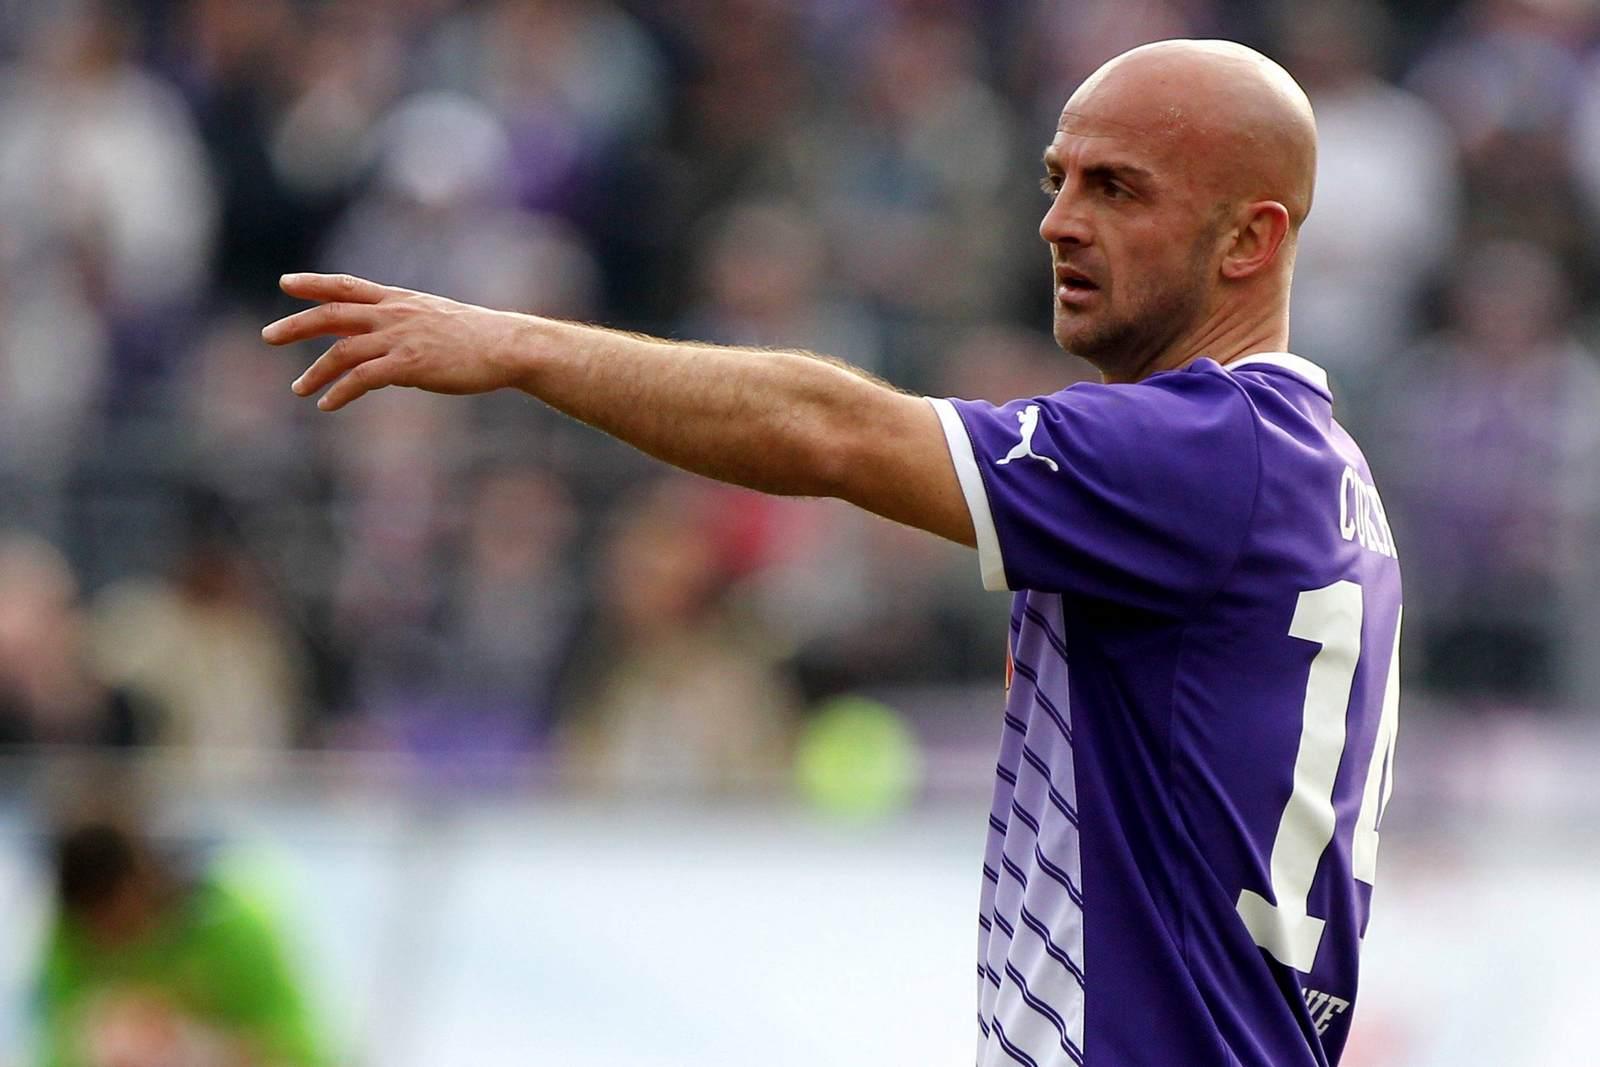 Skerdilaid Curri dirigiert den FC Erzgebirge Aue